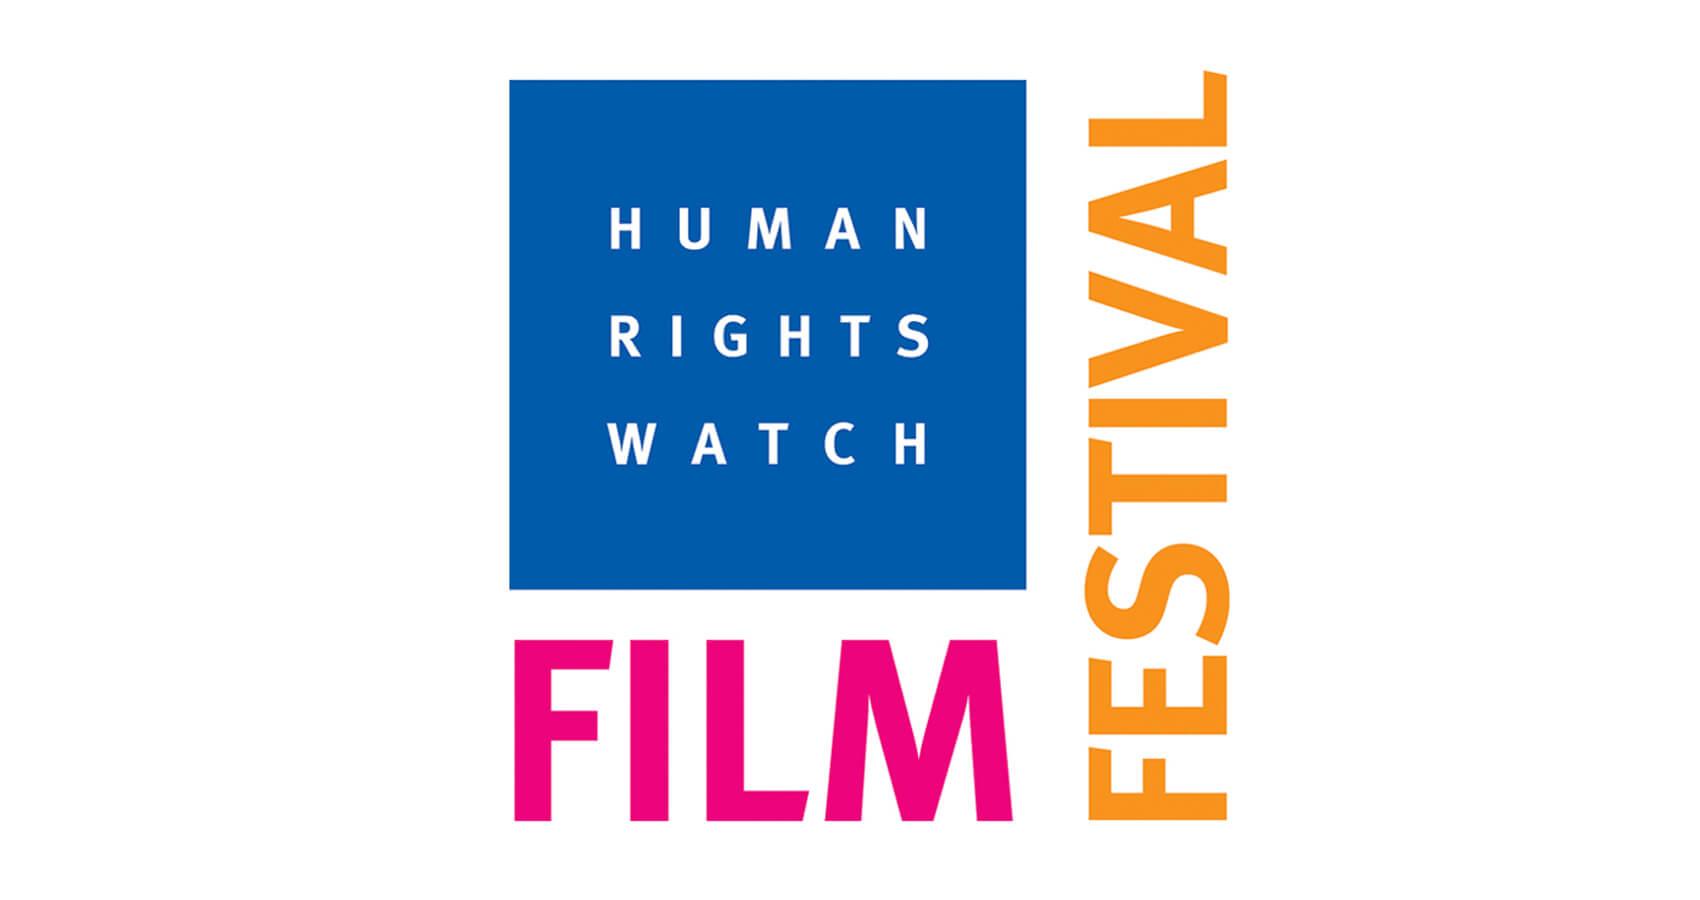 Human Rights Film Festival in NYC & New Delhi